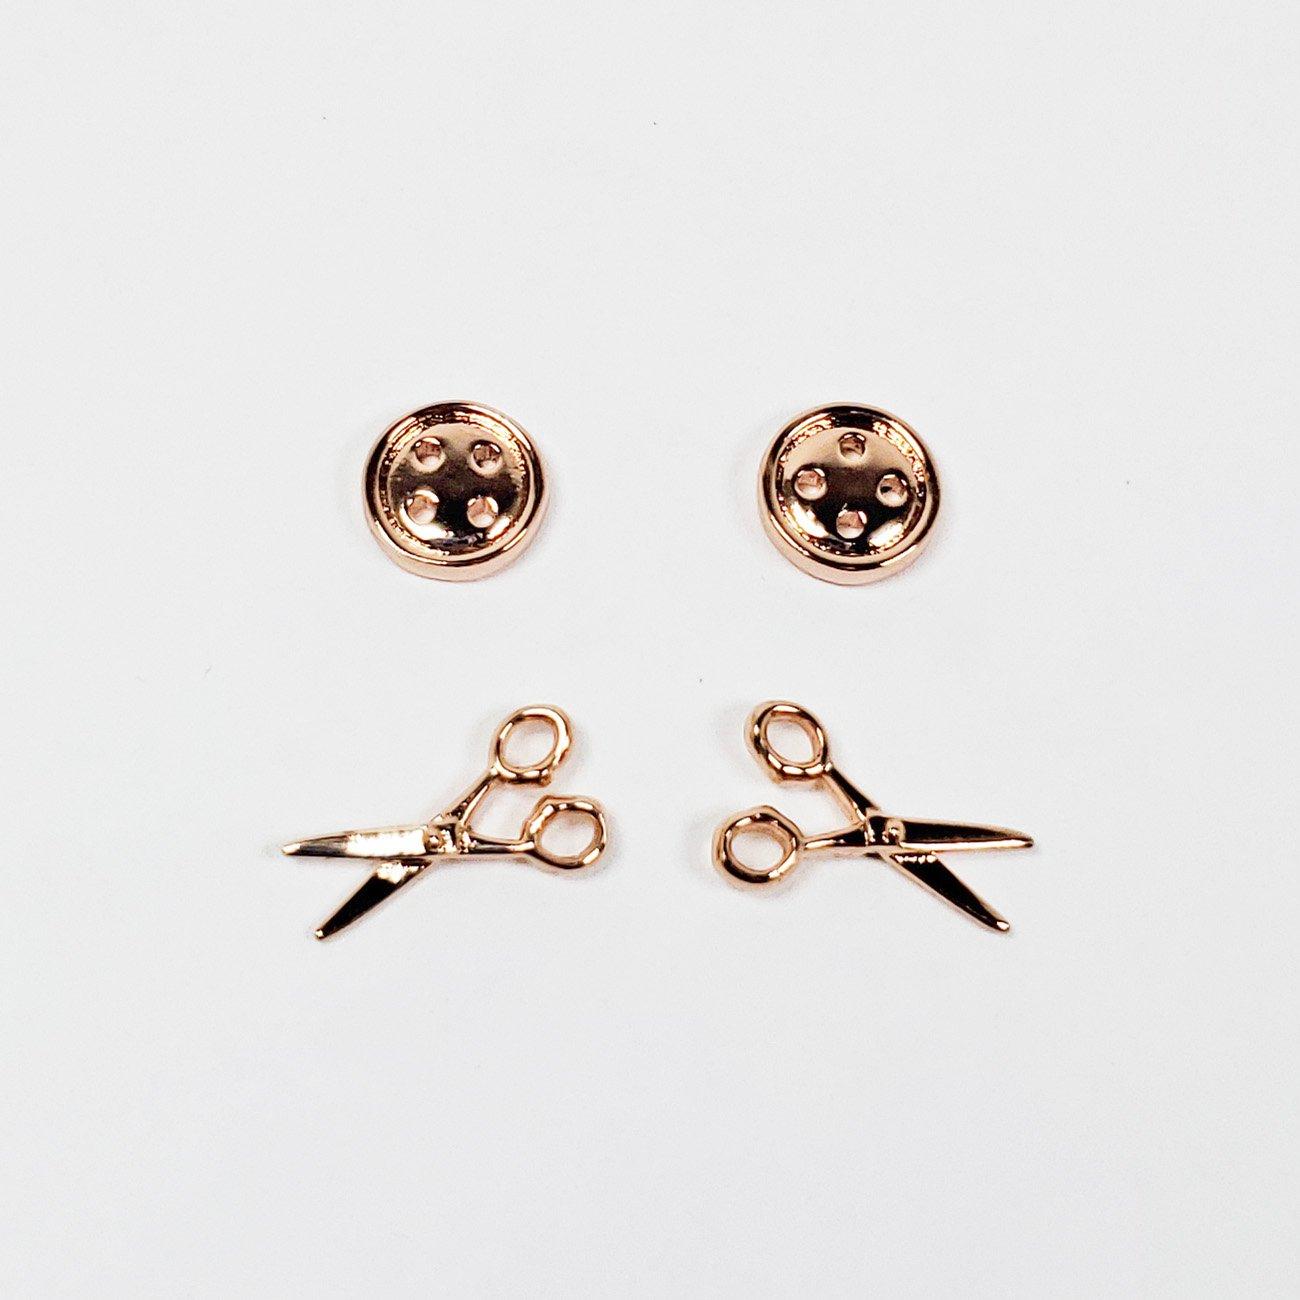 Button Scissors Earrings 2ct Rose Gold